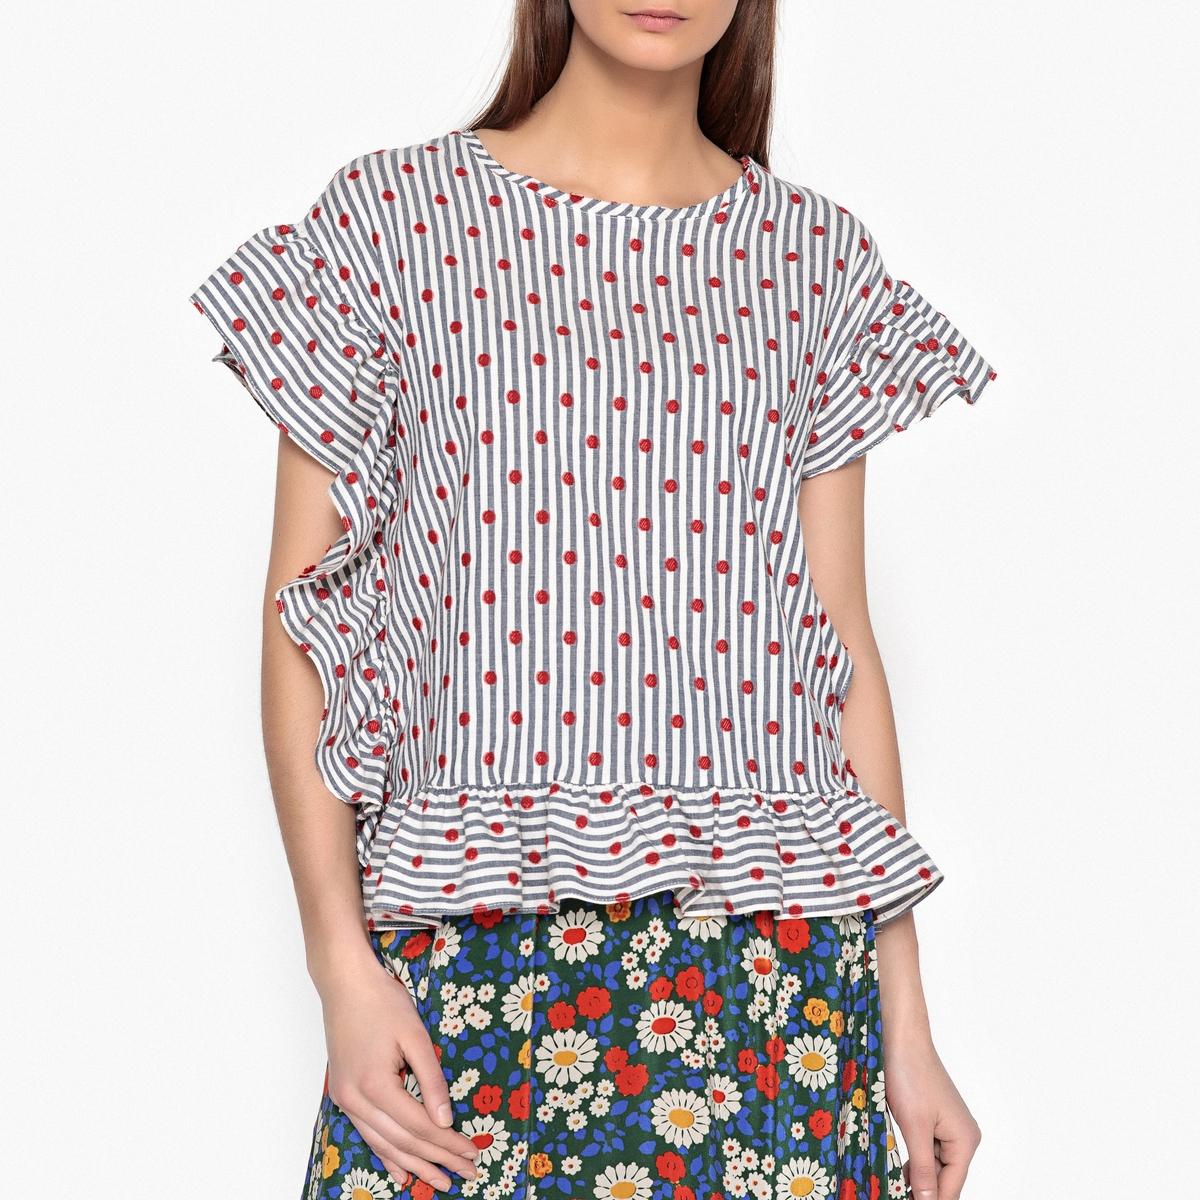 Блузка с рисунком, короткими рукавами и воланами RAMDAM блузка с рисунком и накладными воланами